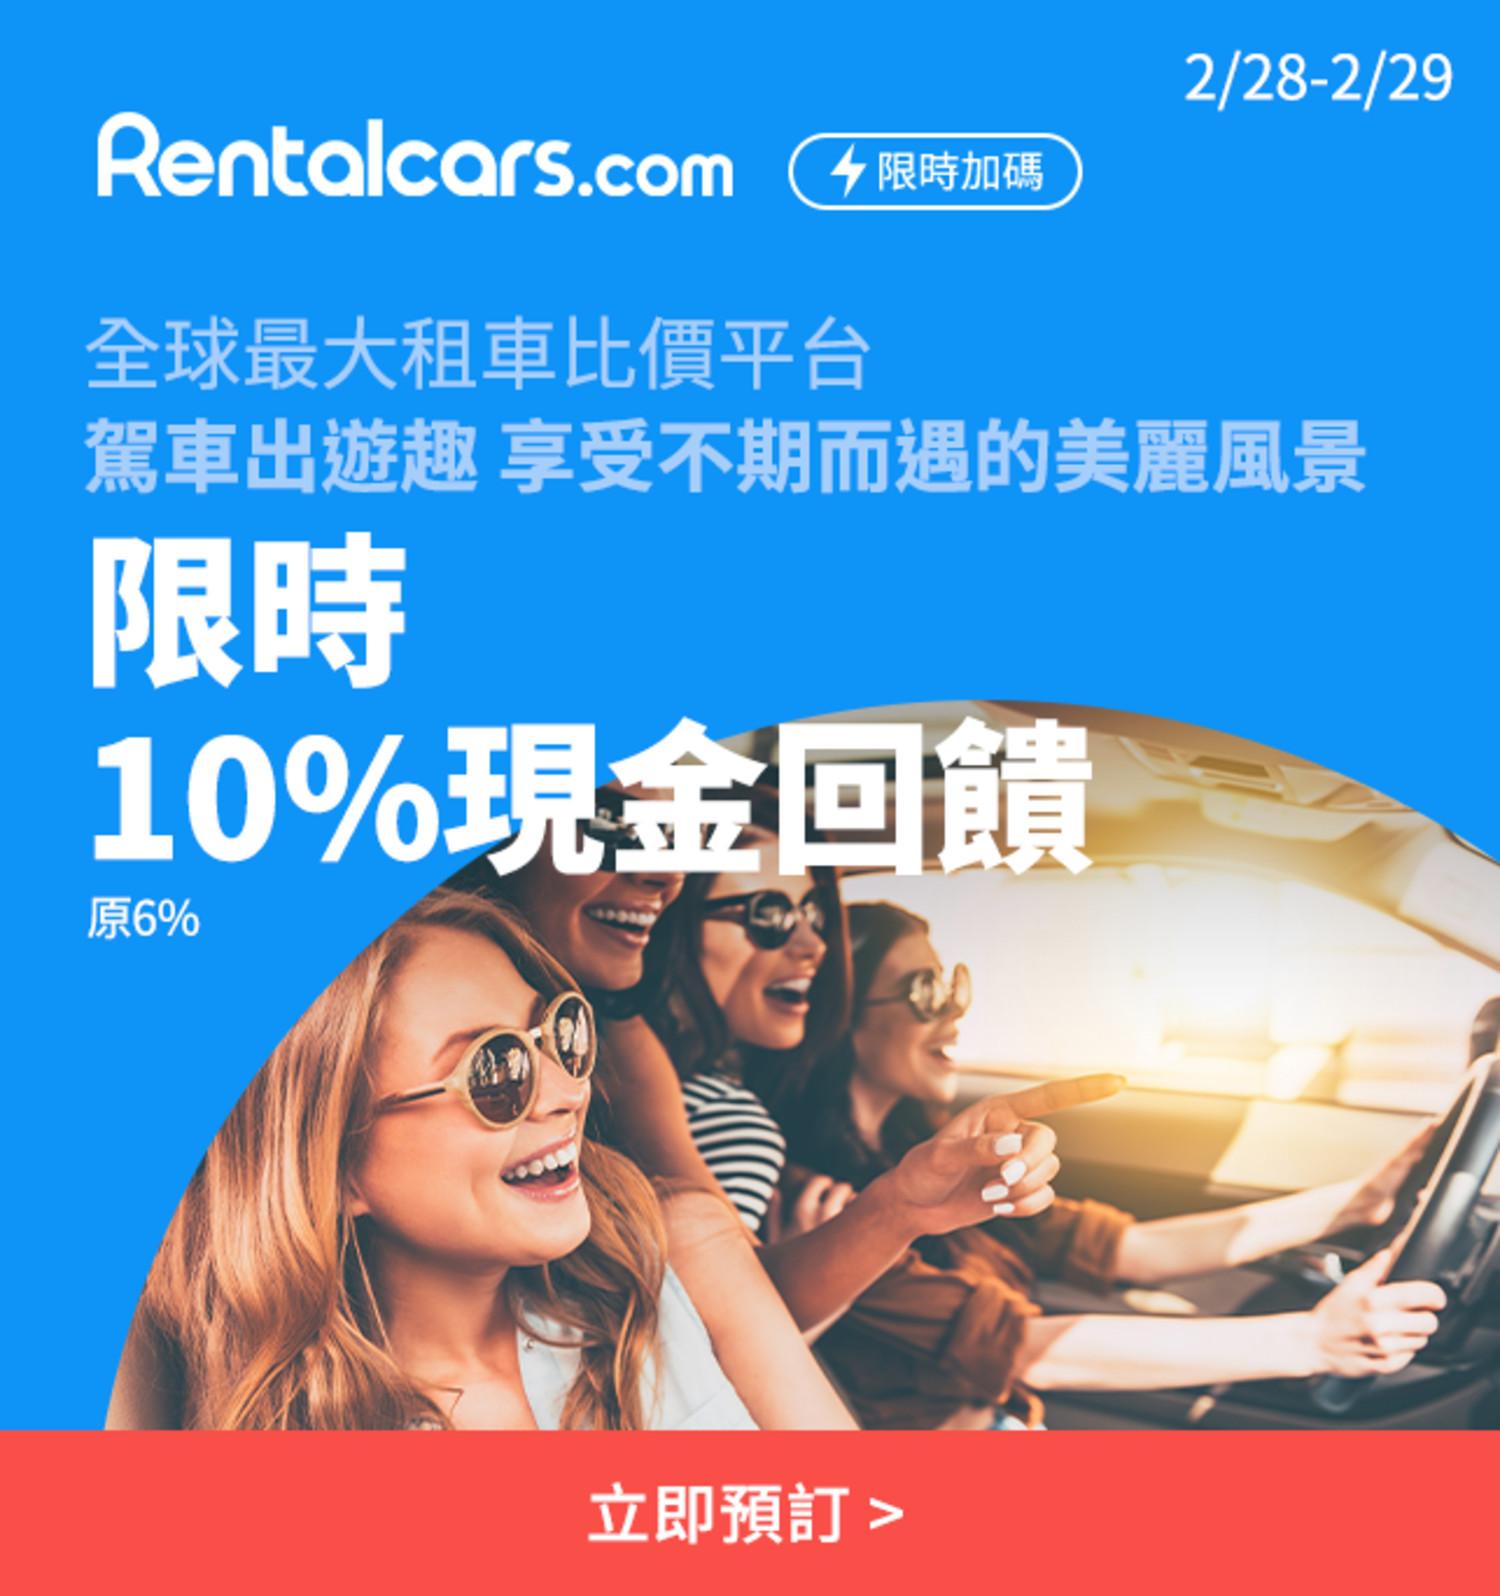 RentalCars加碼 2/28-3/1